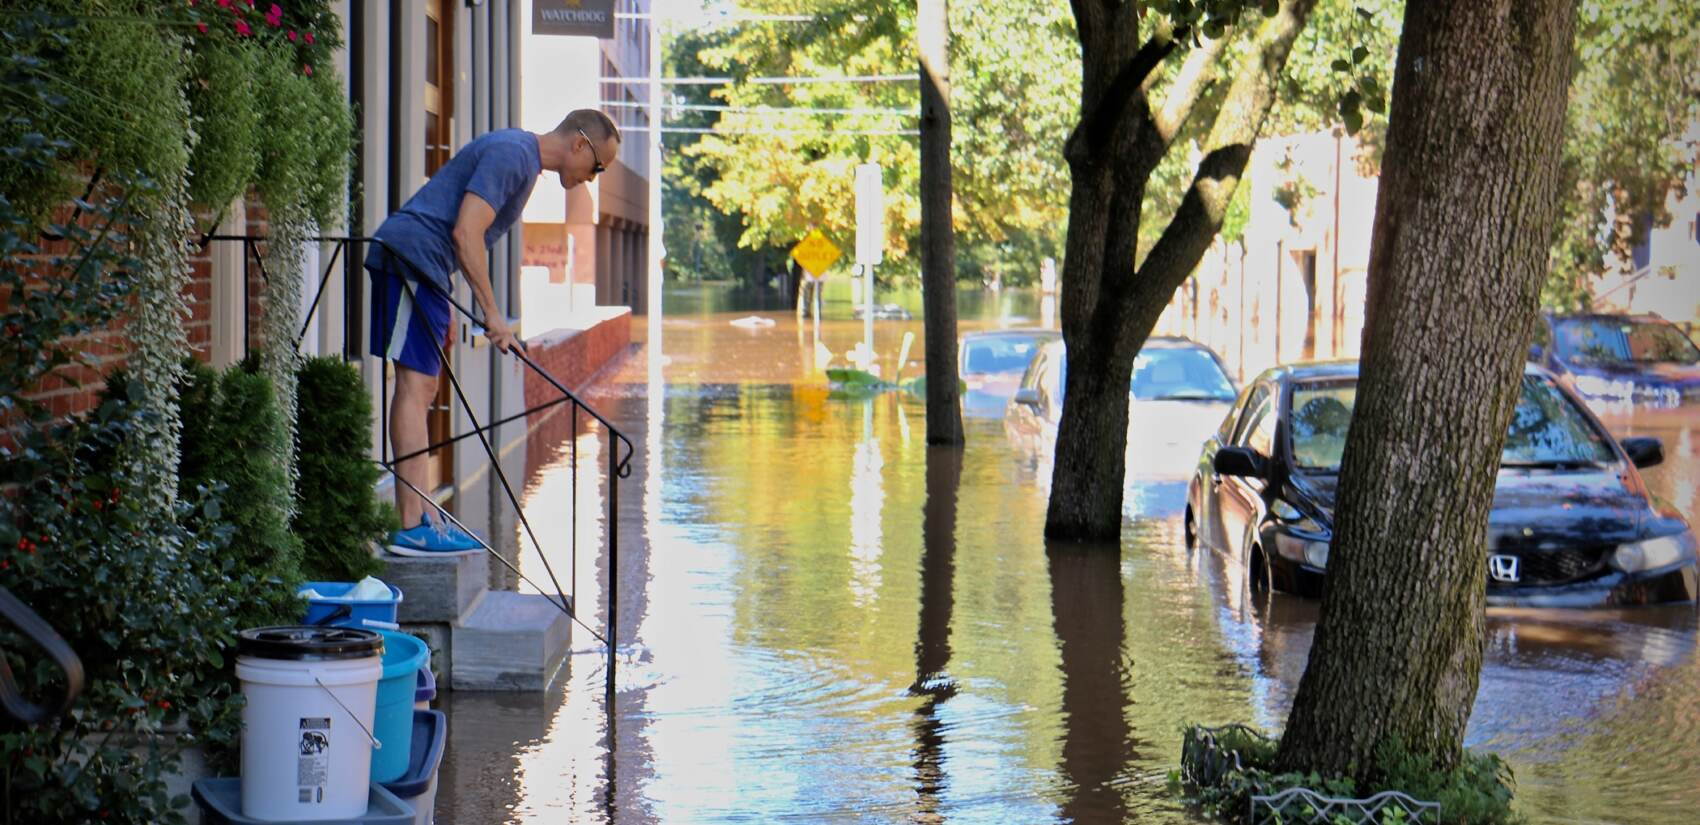 Person observes intense flooding in Philadelphia